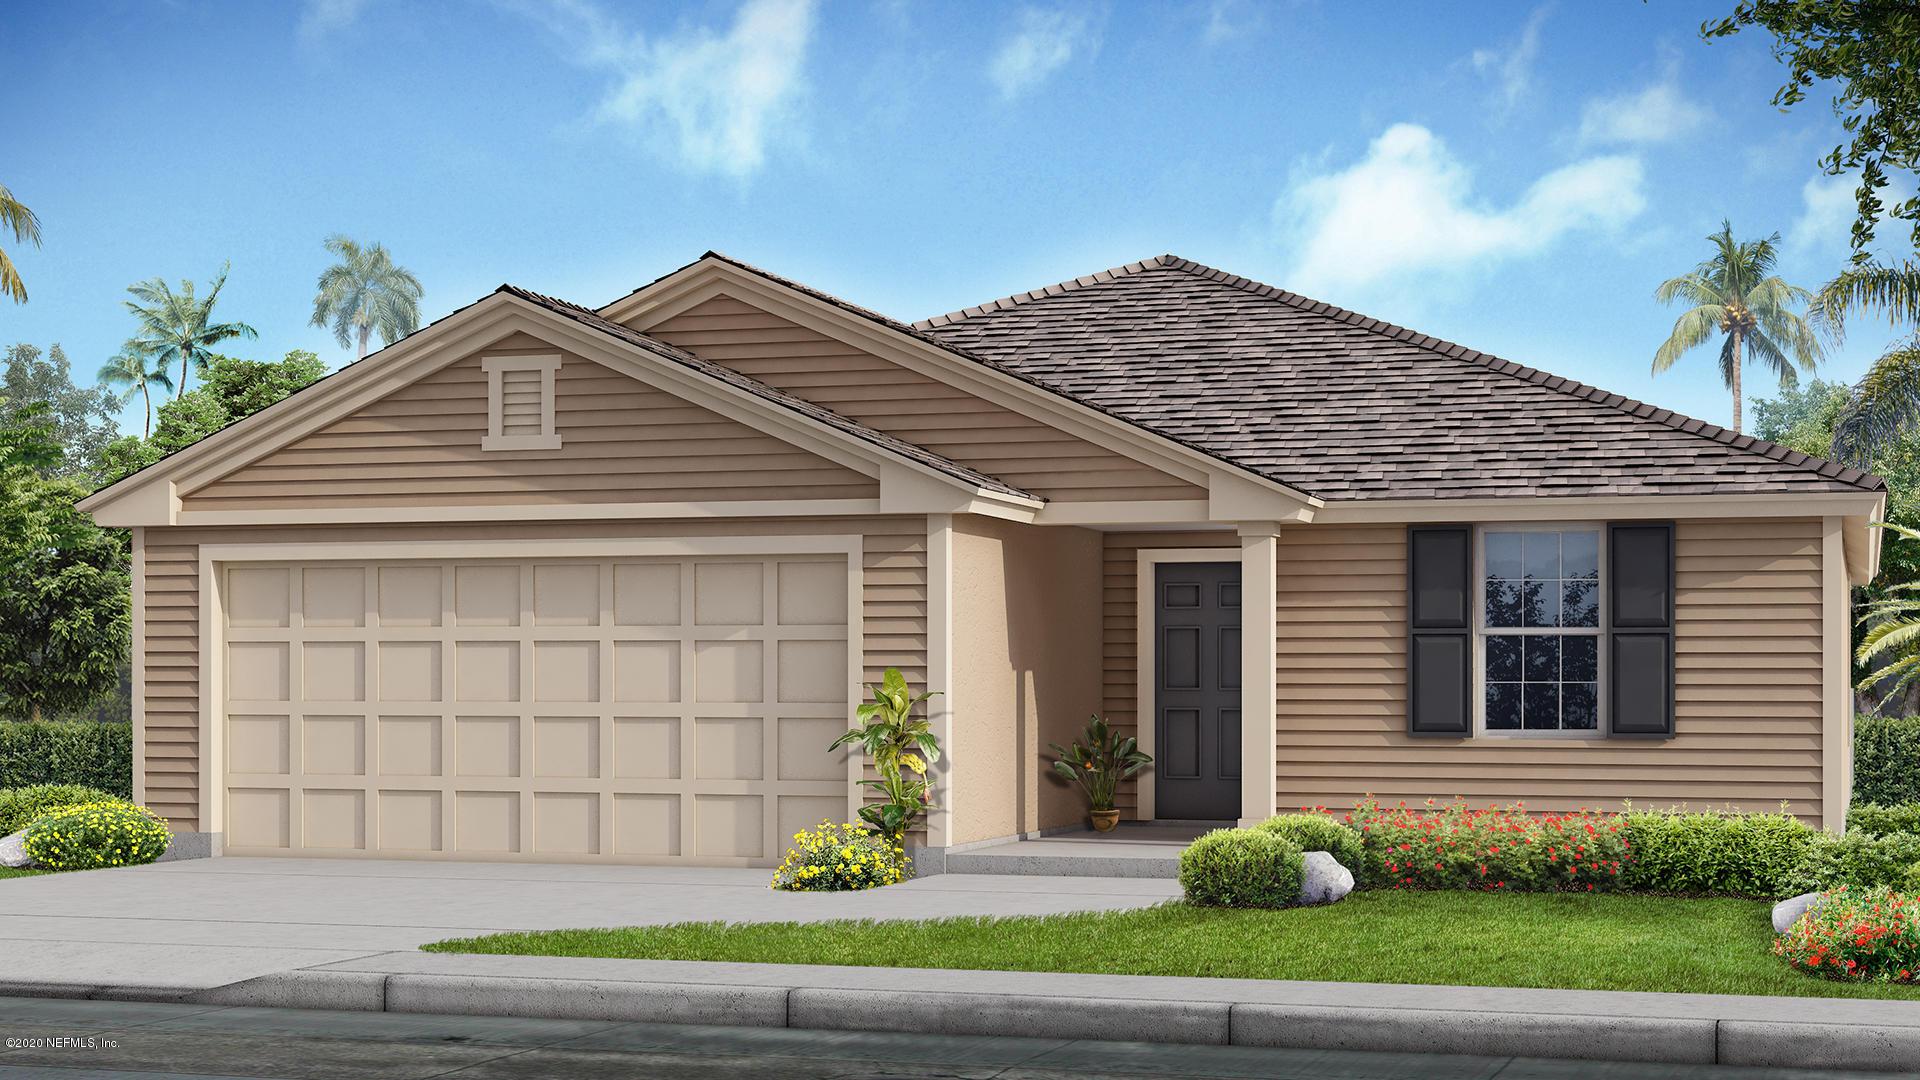 6303 BUCKING BRONCO, JACKSONVILLE, FLORIDA 32234, 3 Bedrooms Bedrooms, ,2 BathroomsBathrooms,Residential,For sale,BUCKING BRONCO,1051861